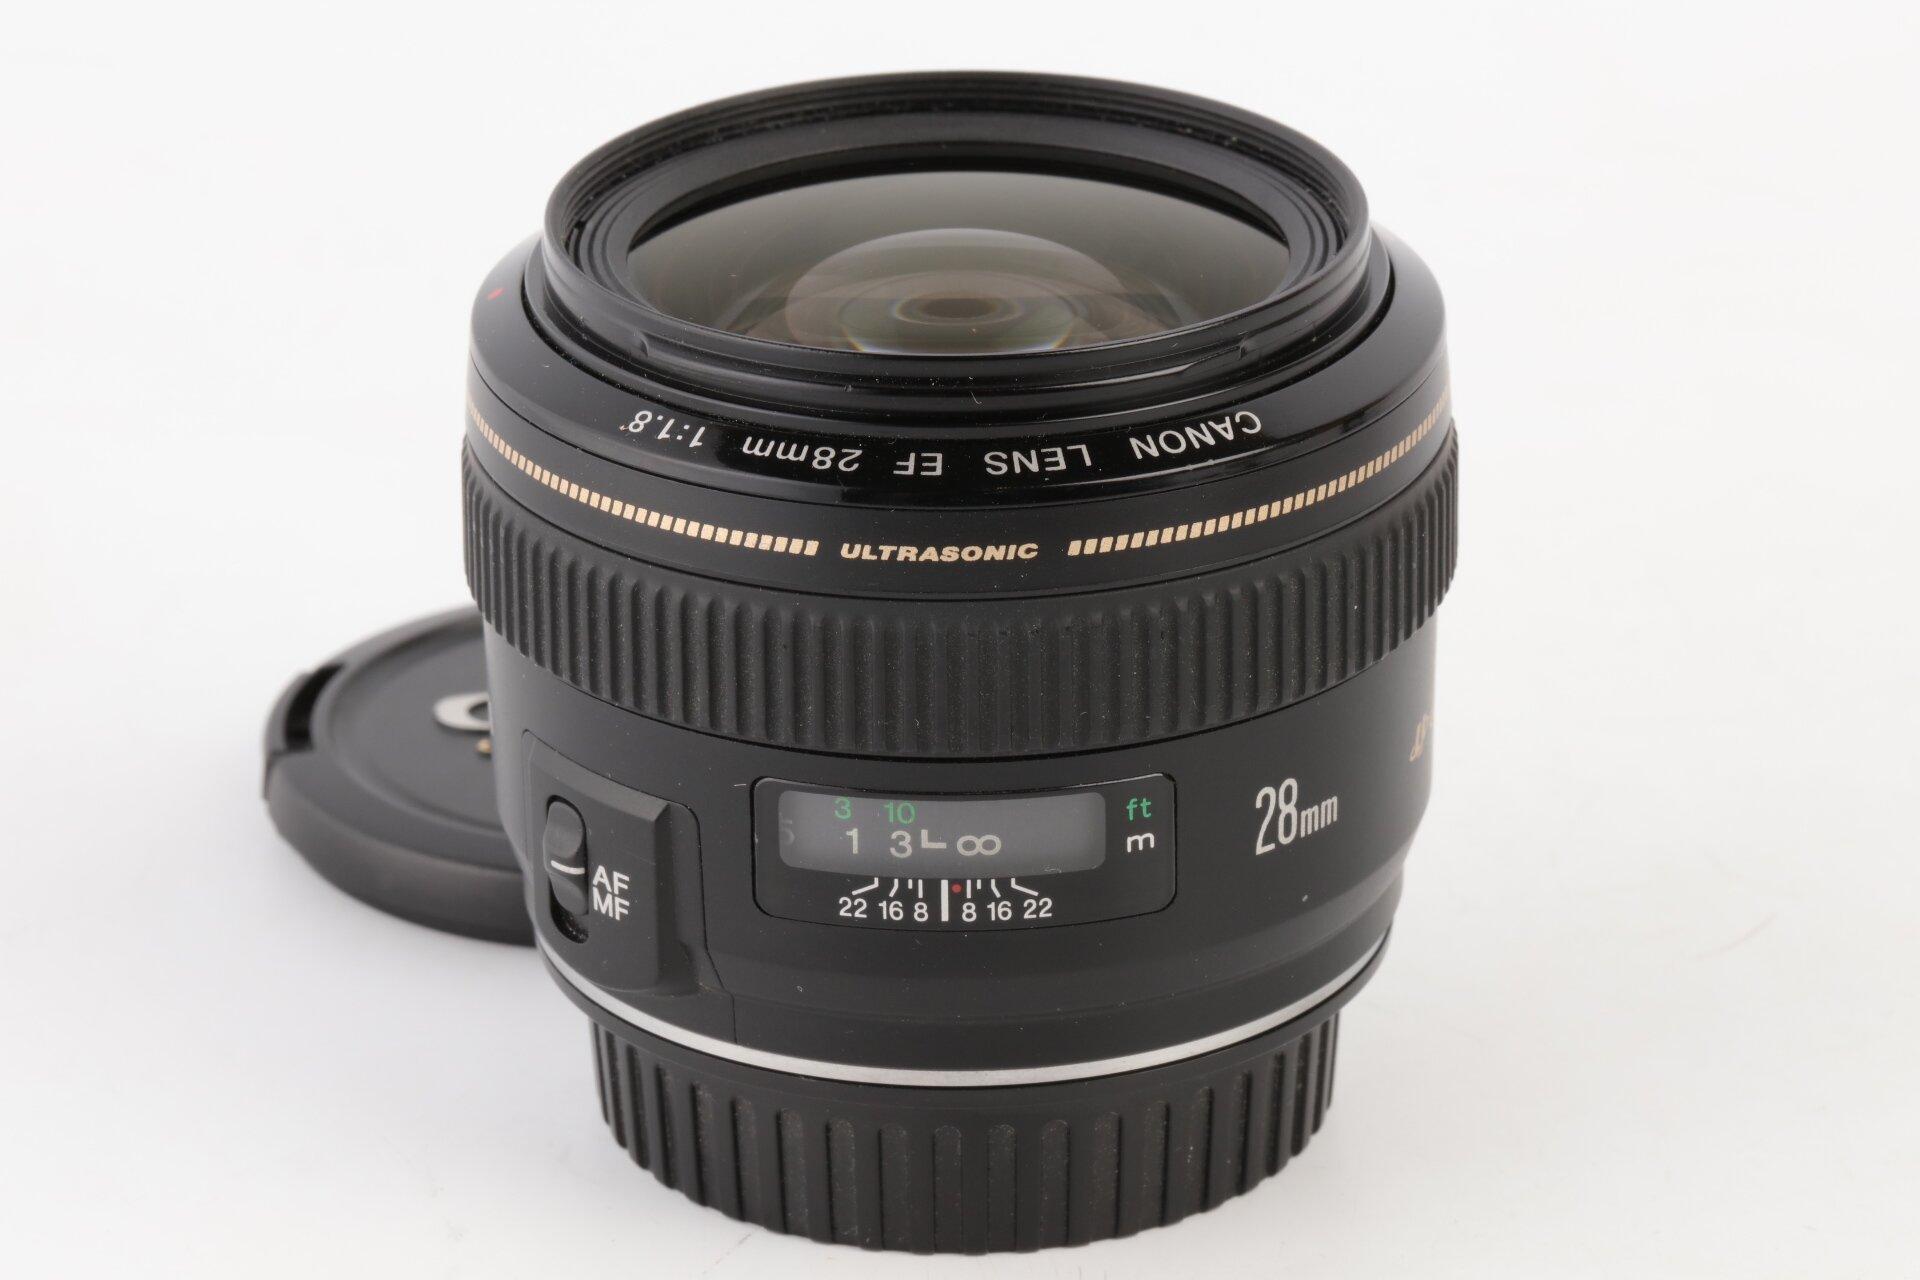 Canon EF 28mm 1,8 USM